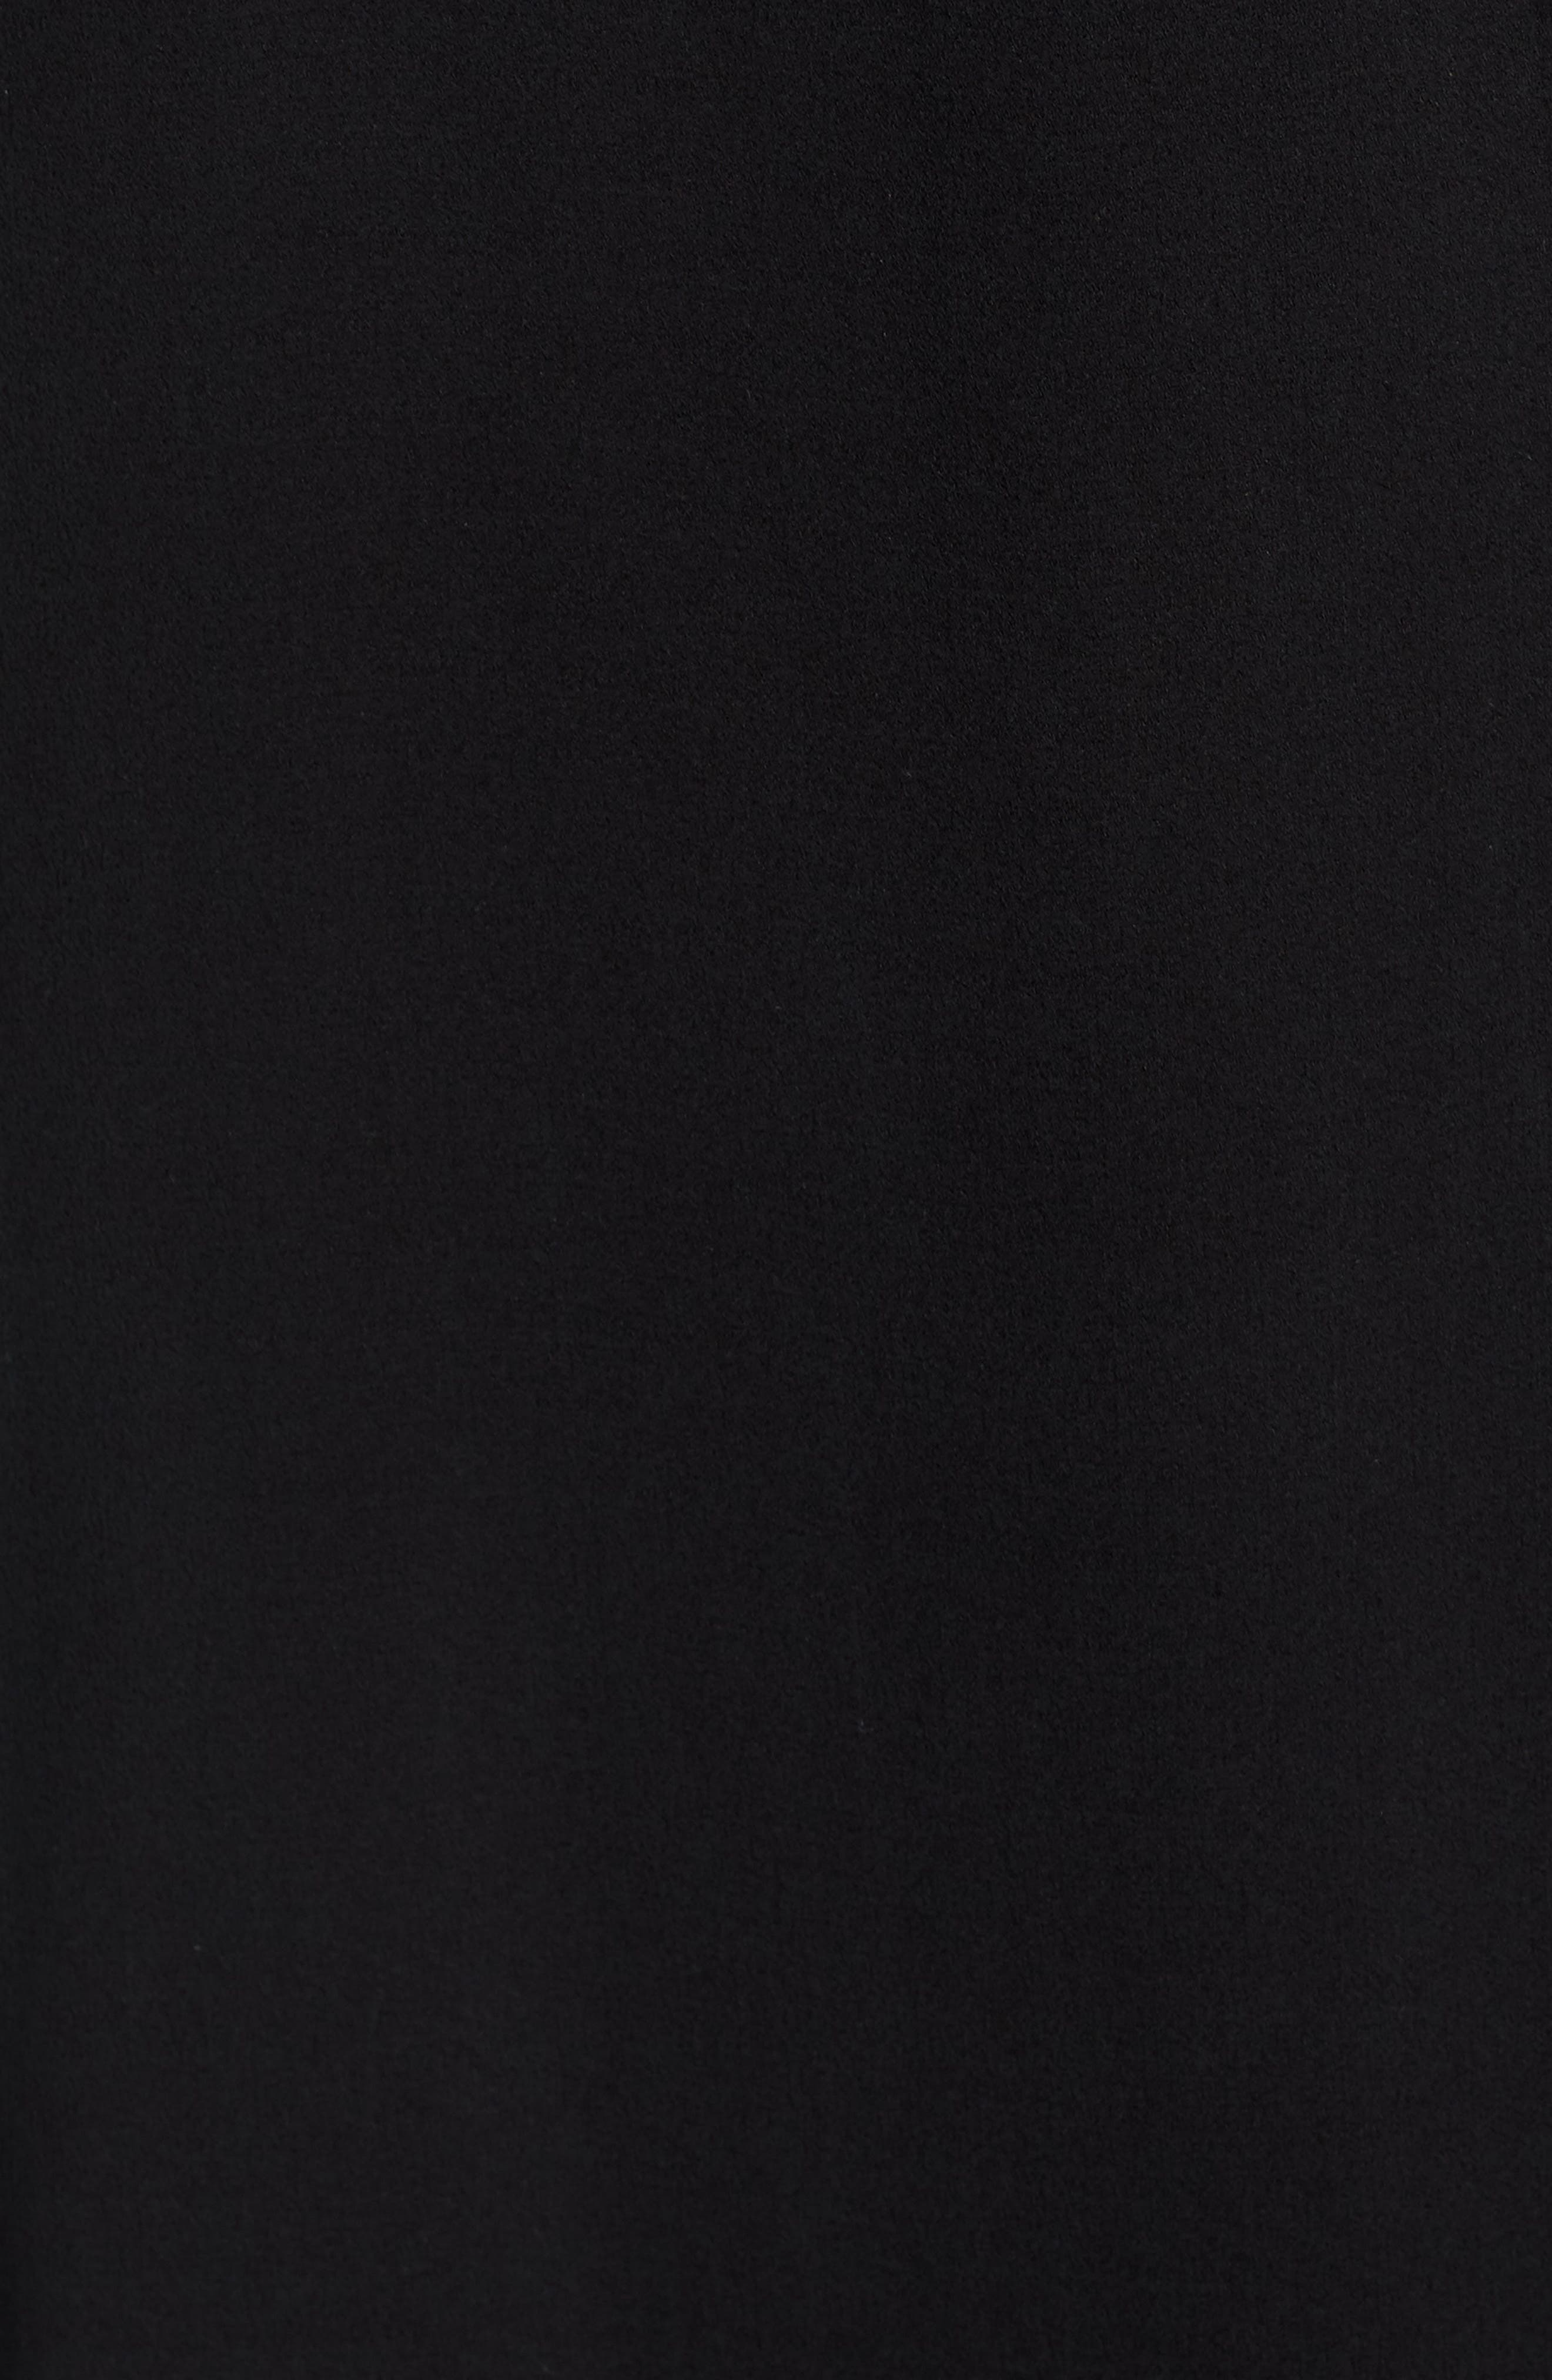 Silk Wrap Dress,                             Alternate thumbnail 6, color,                             001